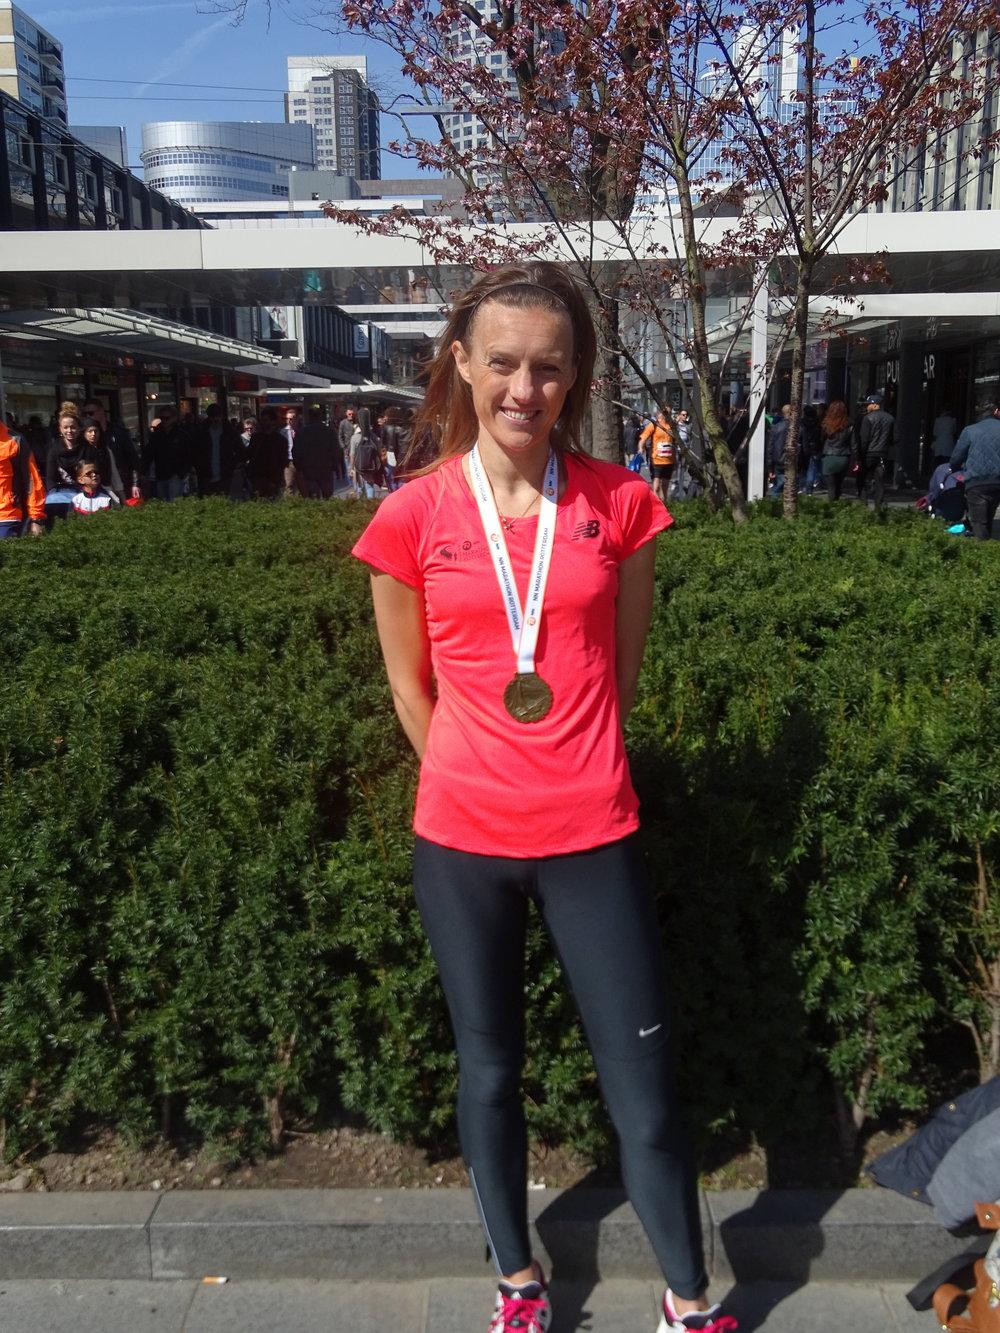 Vicky still smiling after the Rotterdam Marathon